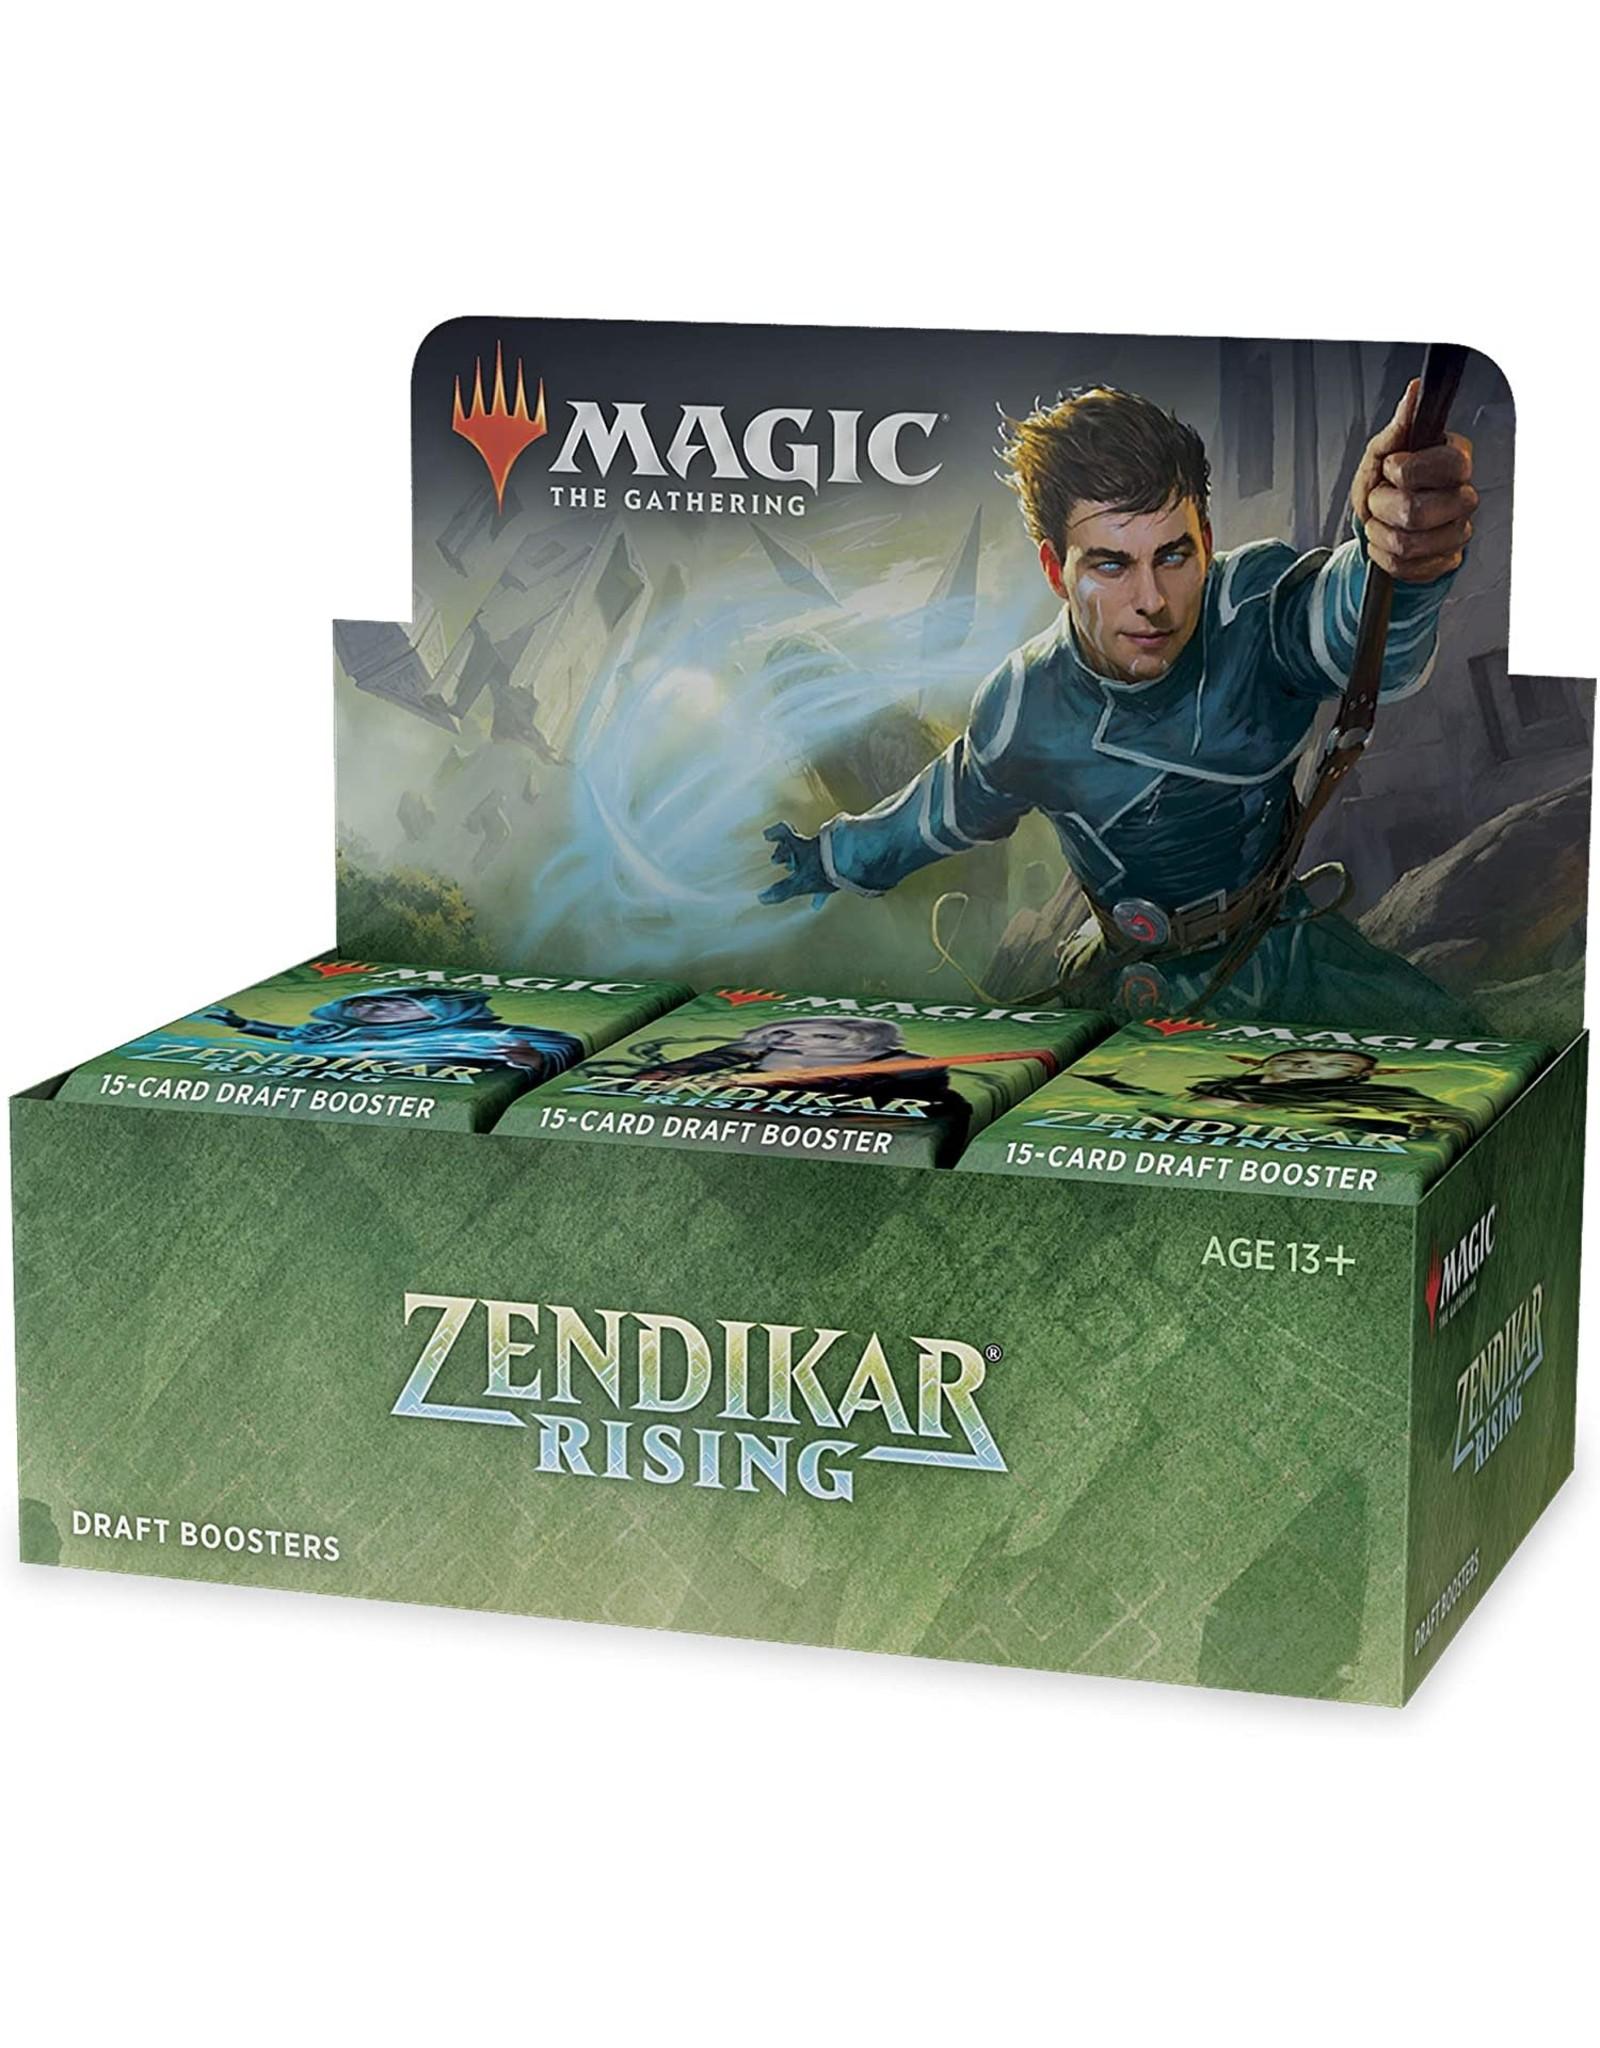 Wizards of the Coast Zendikar Rising Draft Booster Box